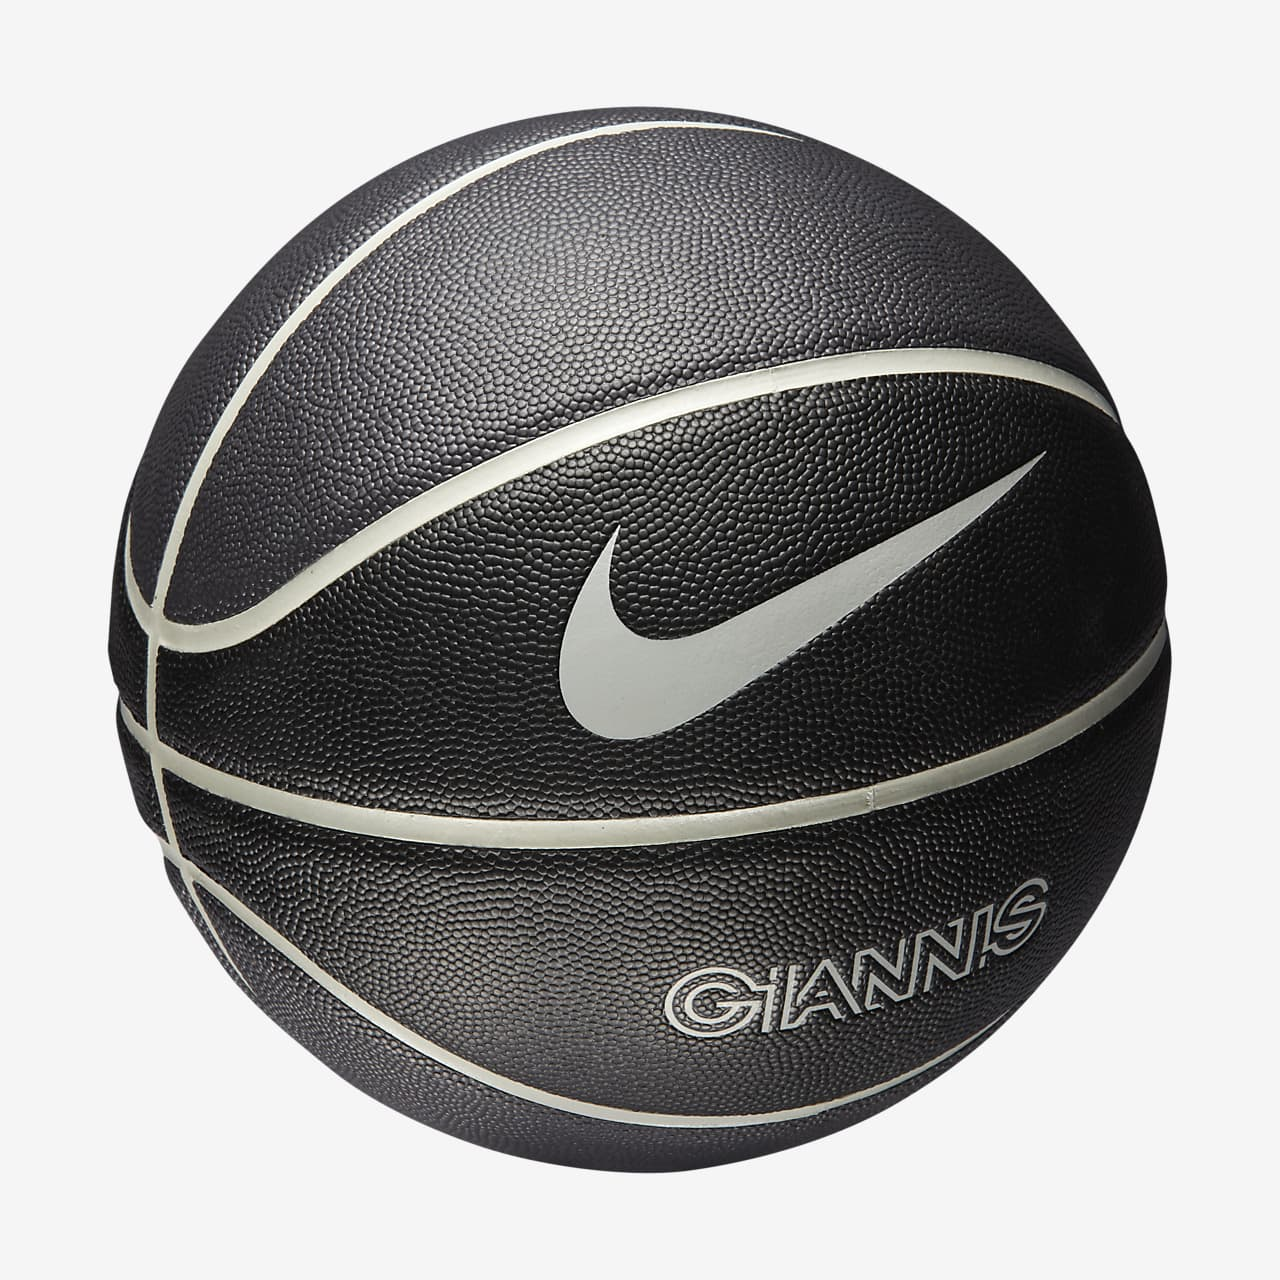 Giannis All Court Basketball